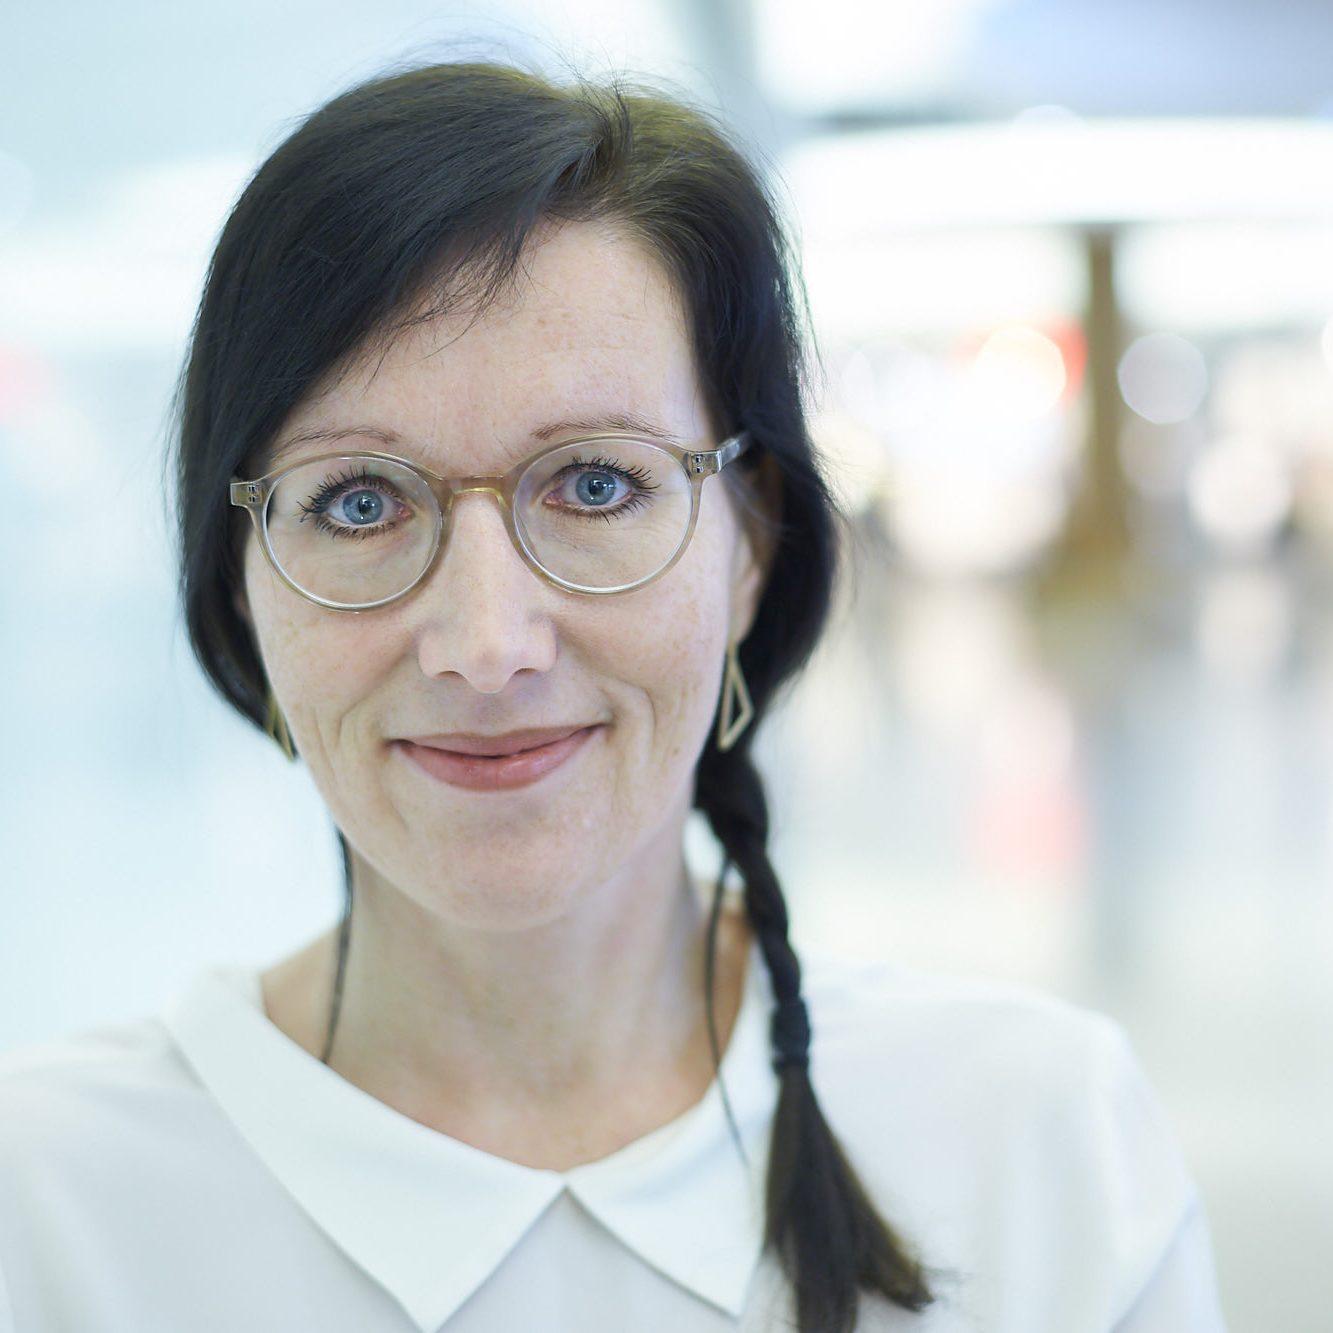 Babett Mahnert - Finanzen für Frauen